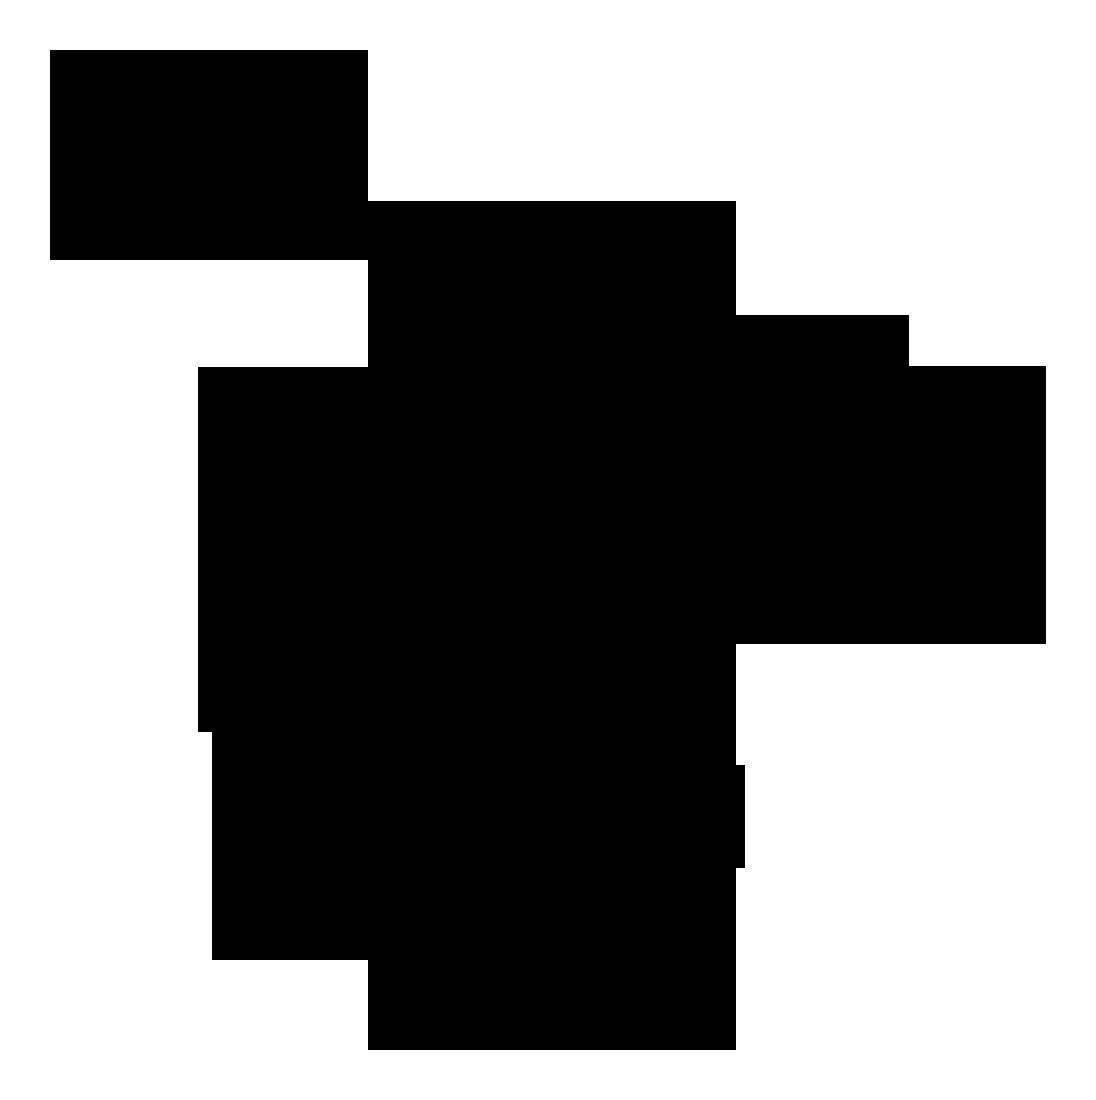 Prograf Tacrolimus